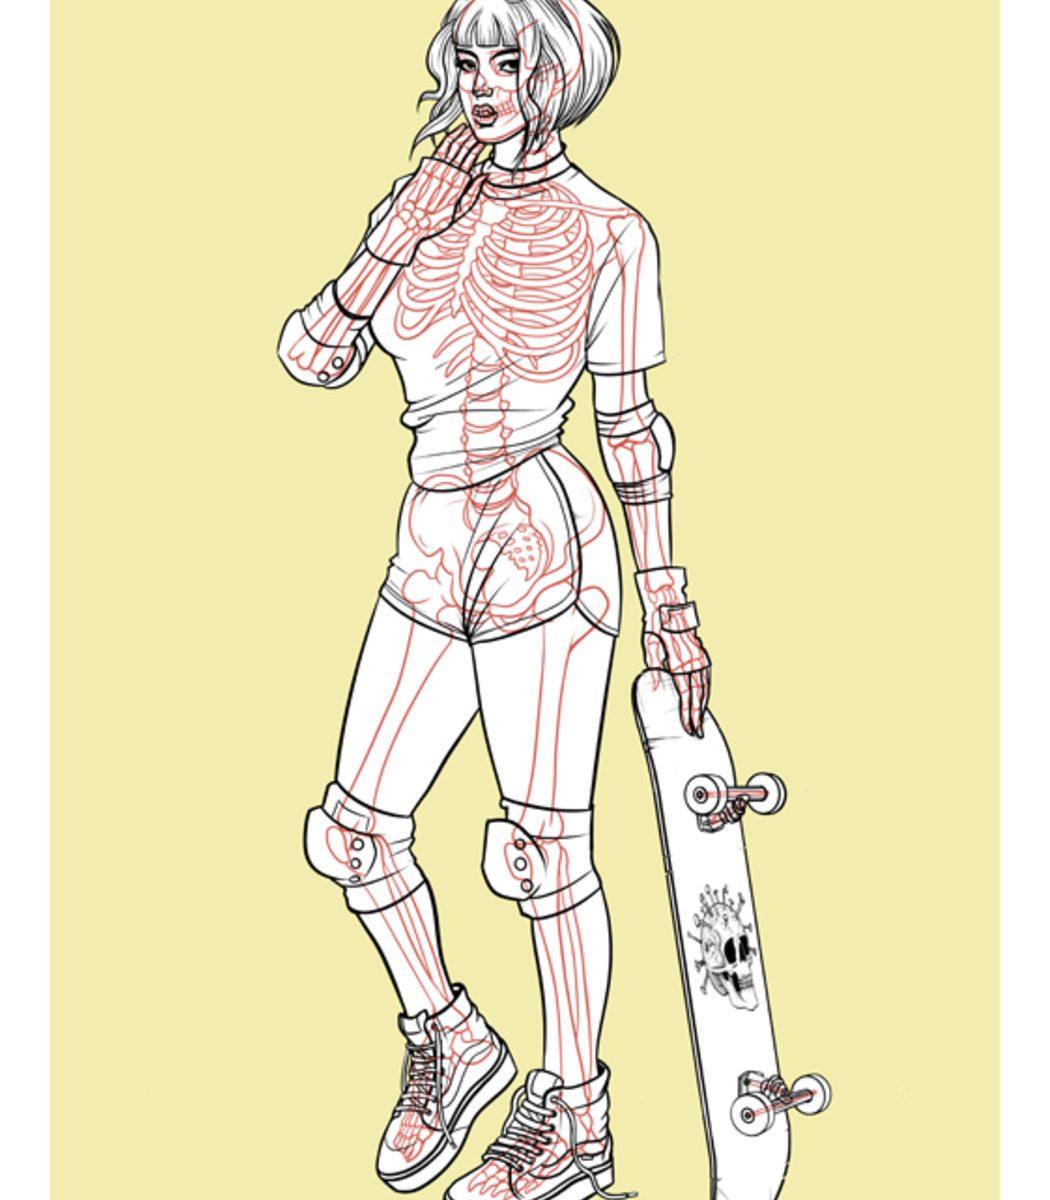 Hutch - Protect your bones